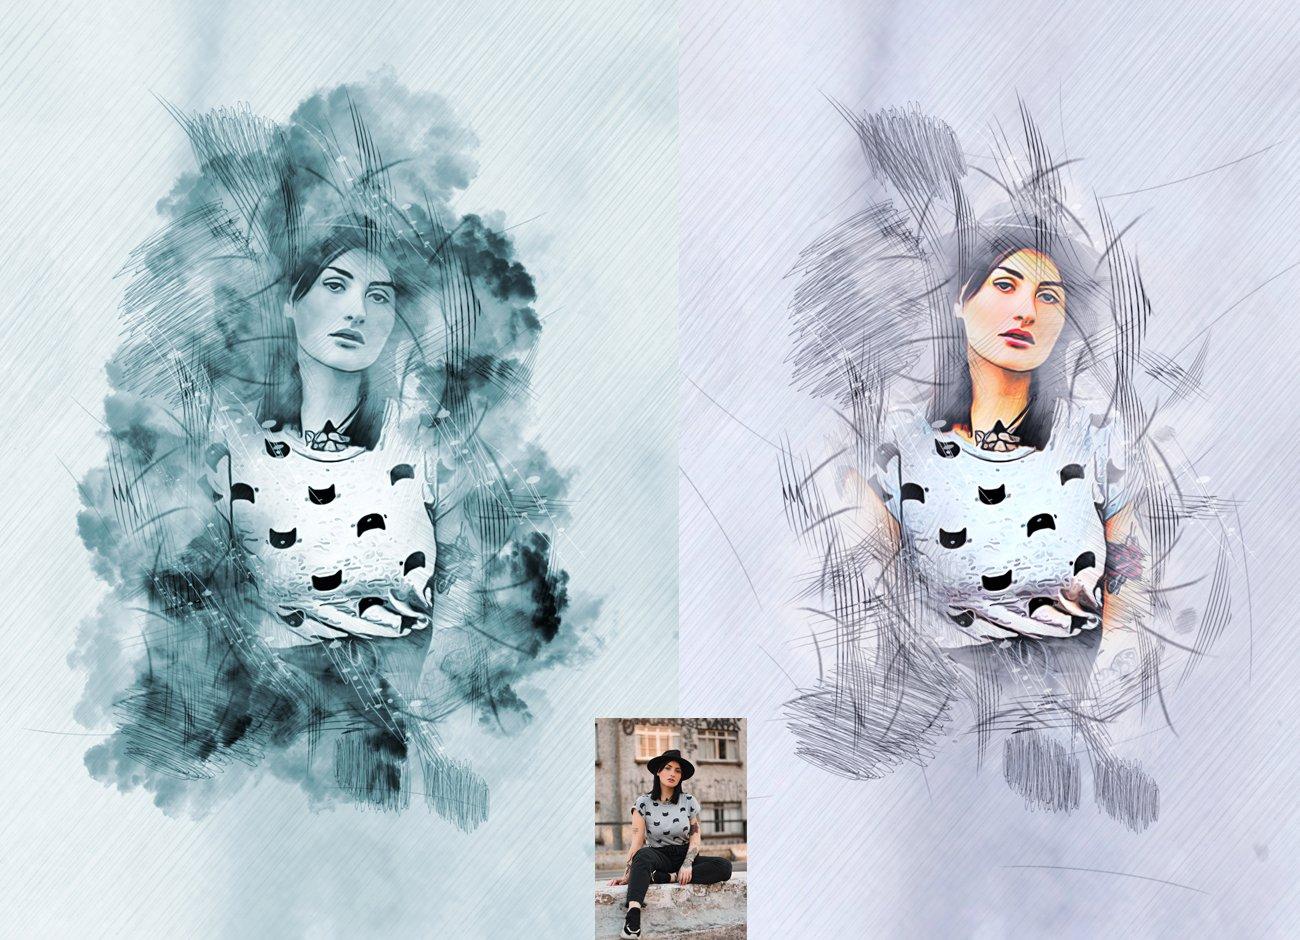 水墨素描效果照片处理特效PS动作模板 Ink Sketch Art Photoshop Action插图3